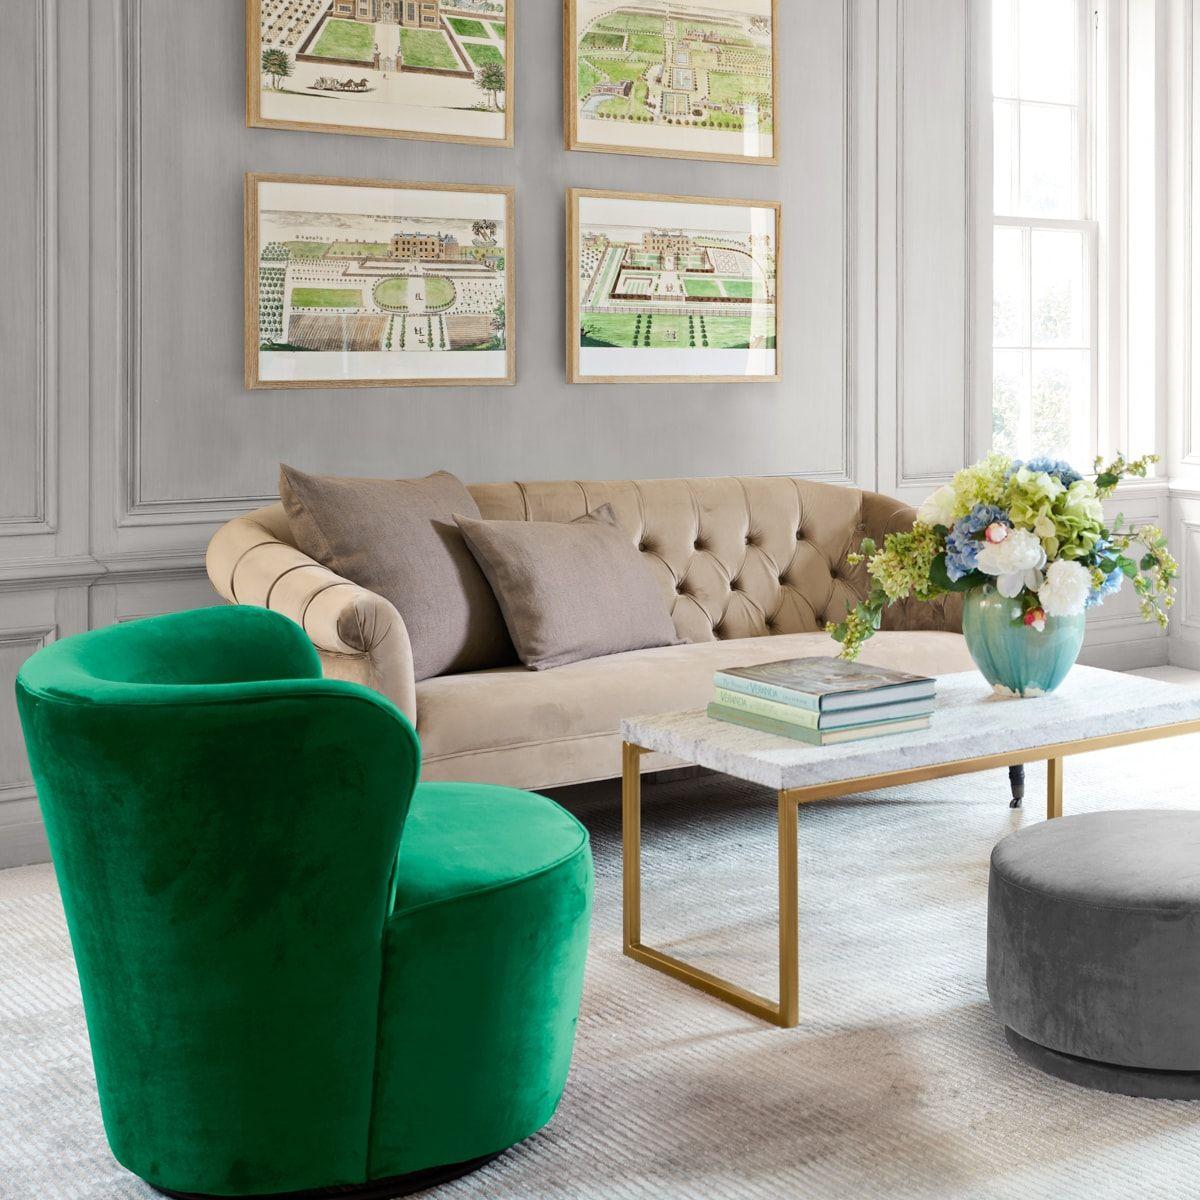 Modern Velvet Swivel Chair Furniture, Accent chairs for